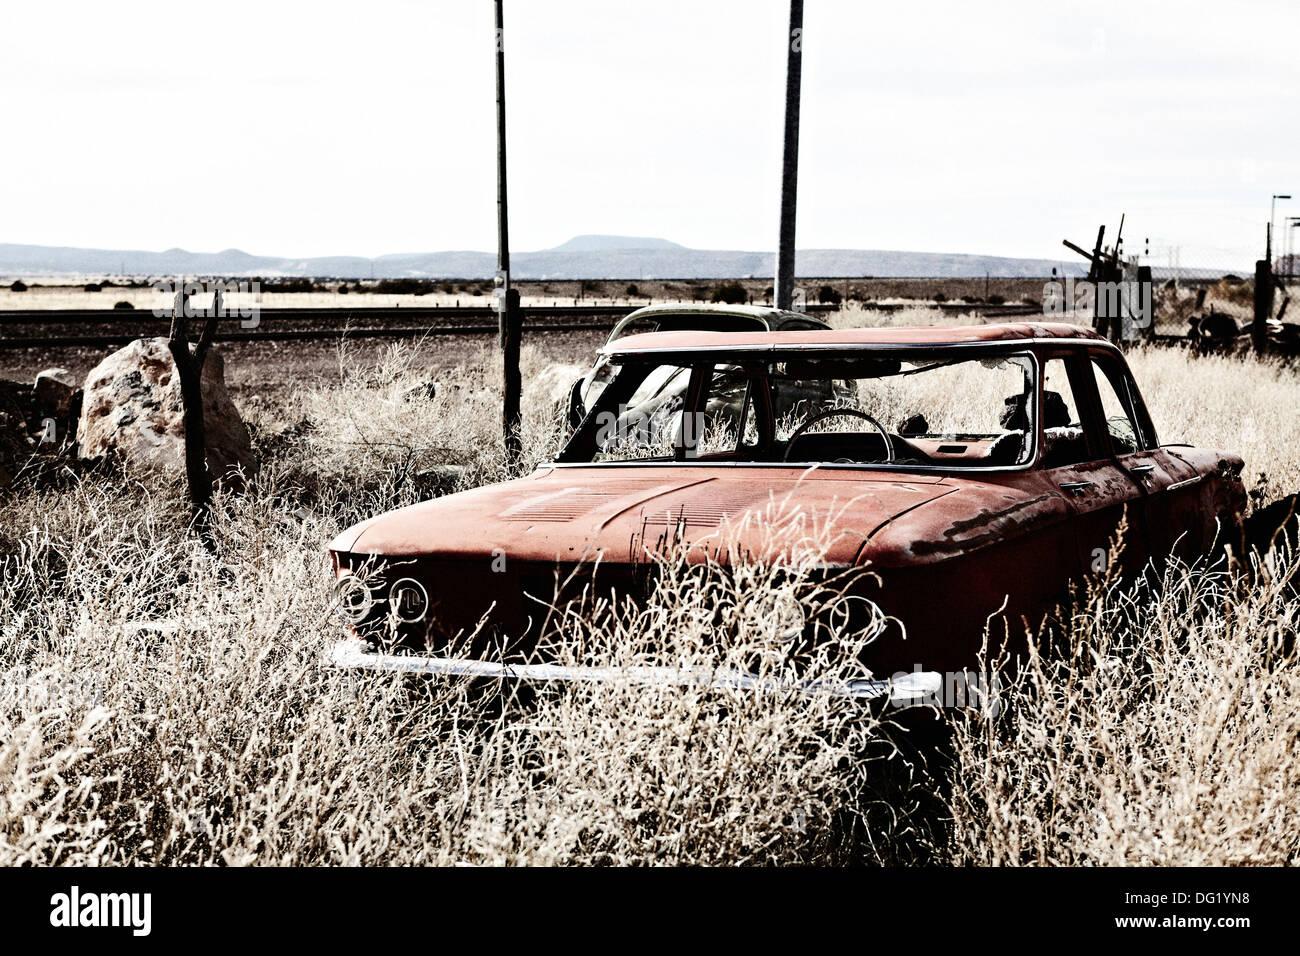 Alte verlassene Autos in der Wüste Stockbild